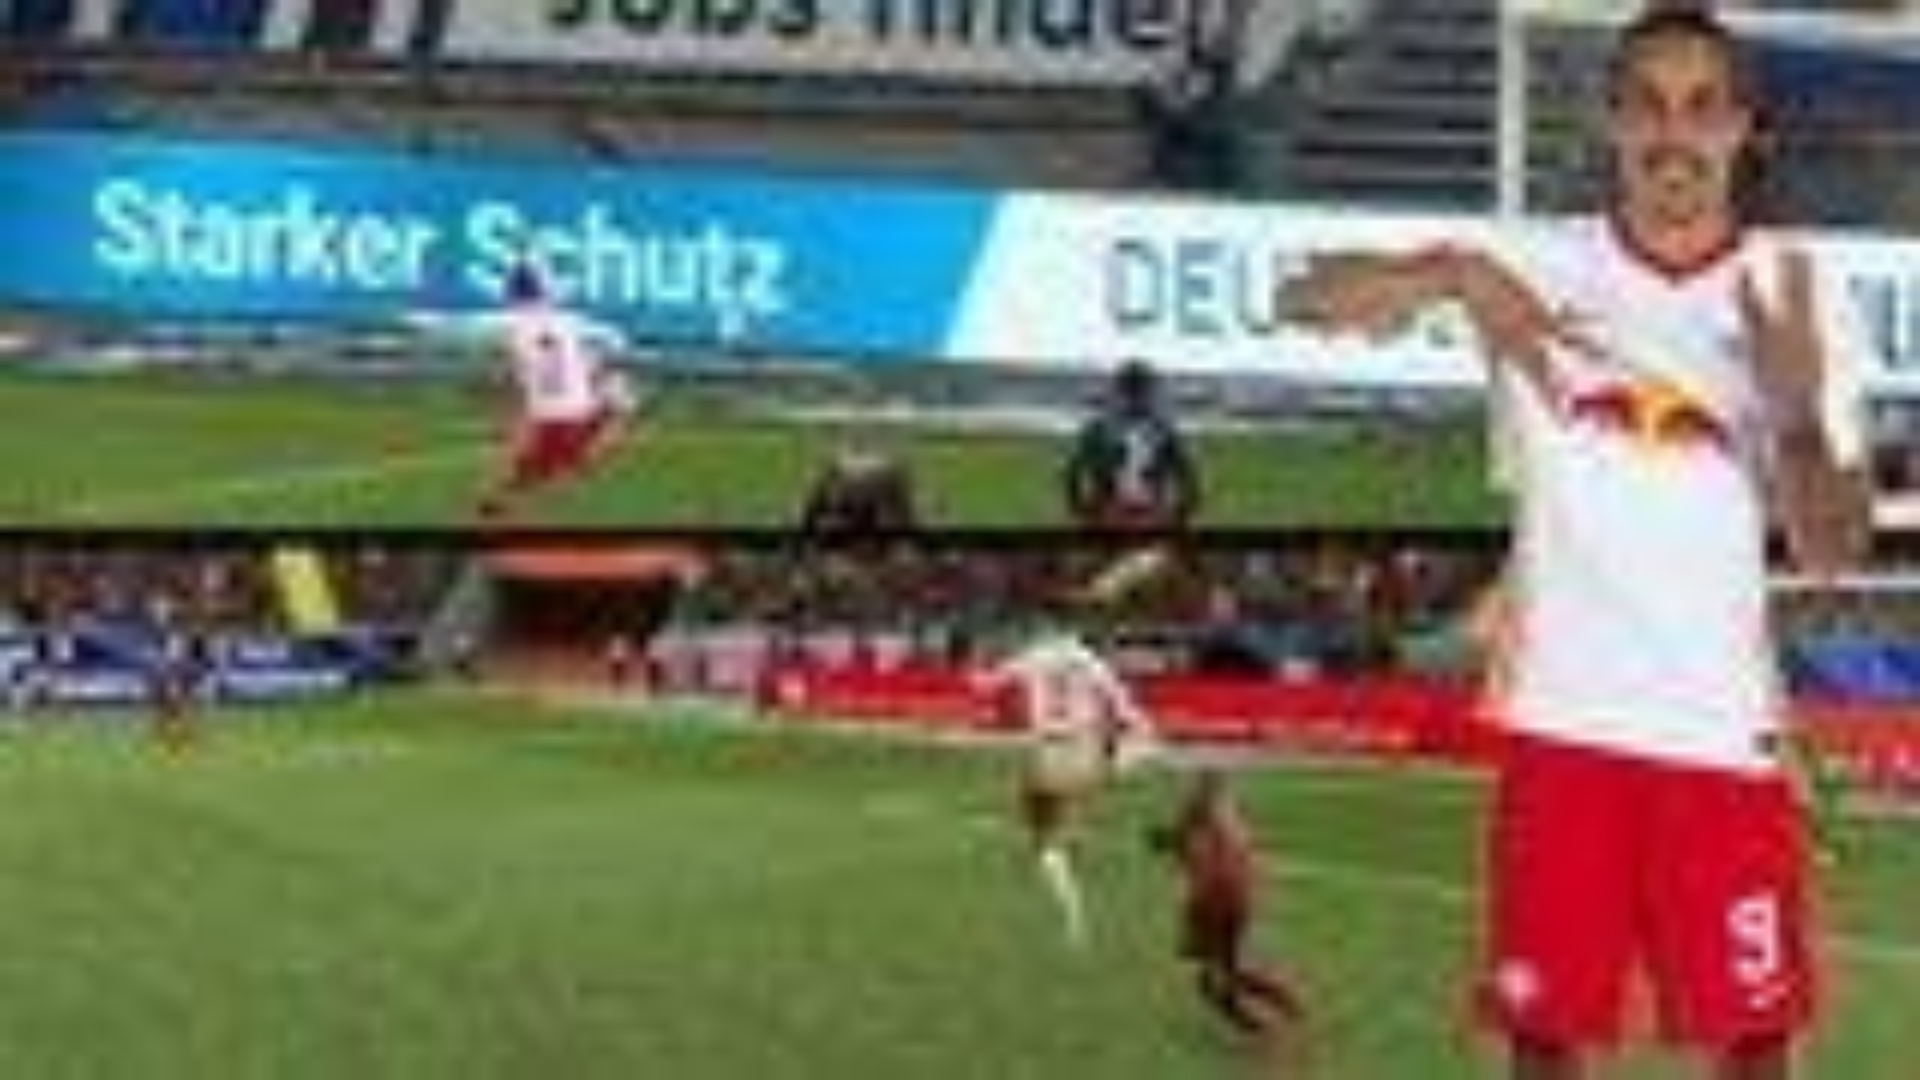 Nachgestellte Tore bei FIFA 21: Poulsen perfekt